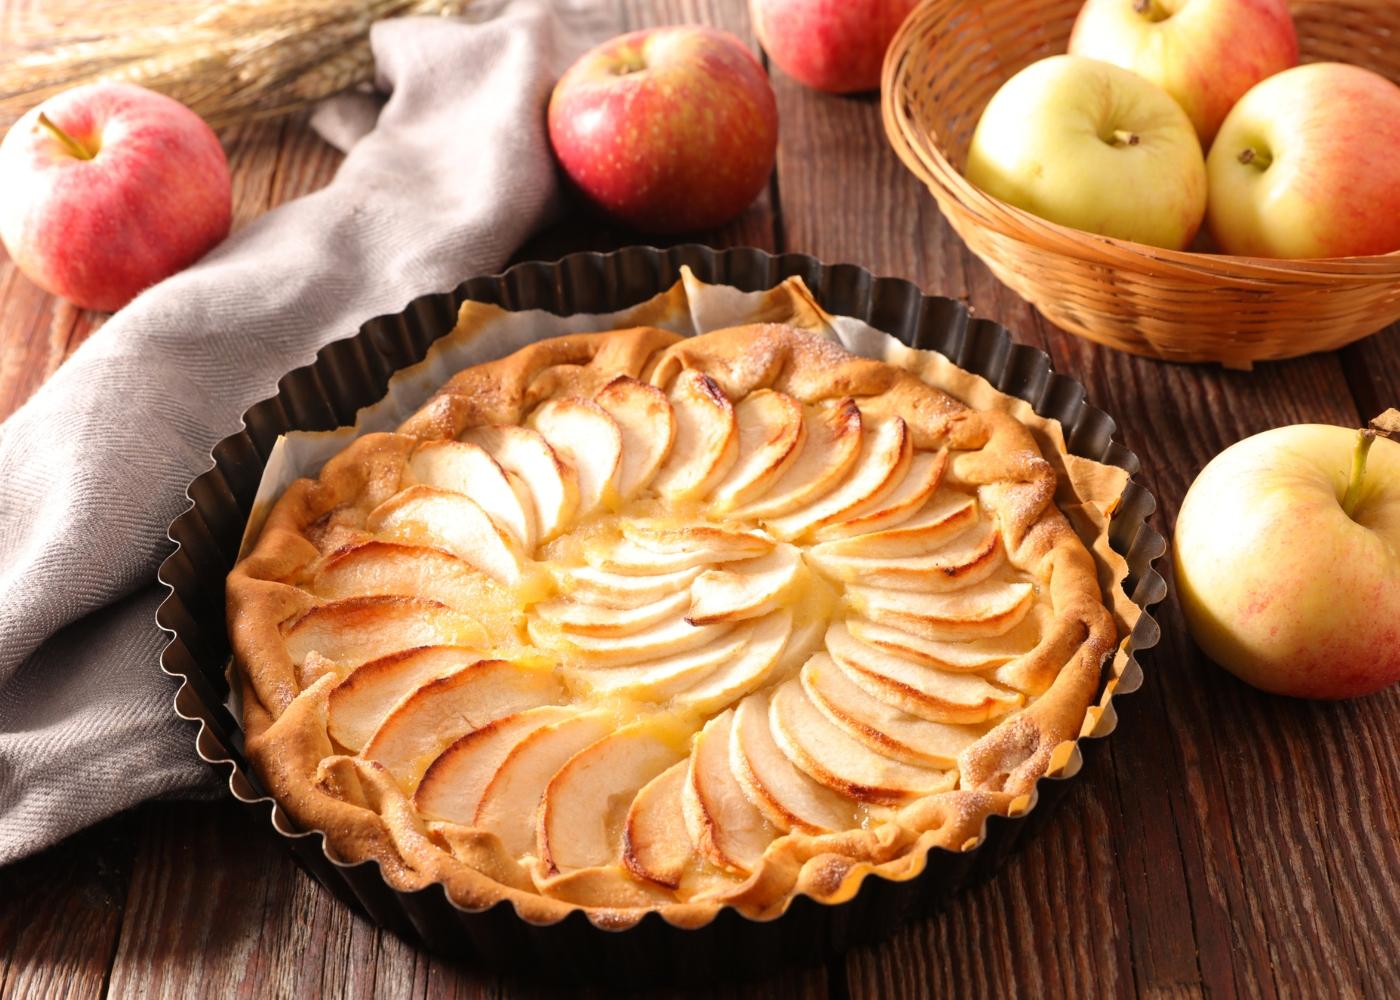 Tarte de maçã sem glúten simples